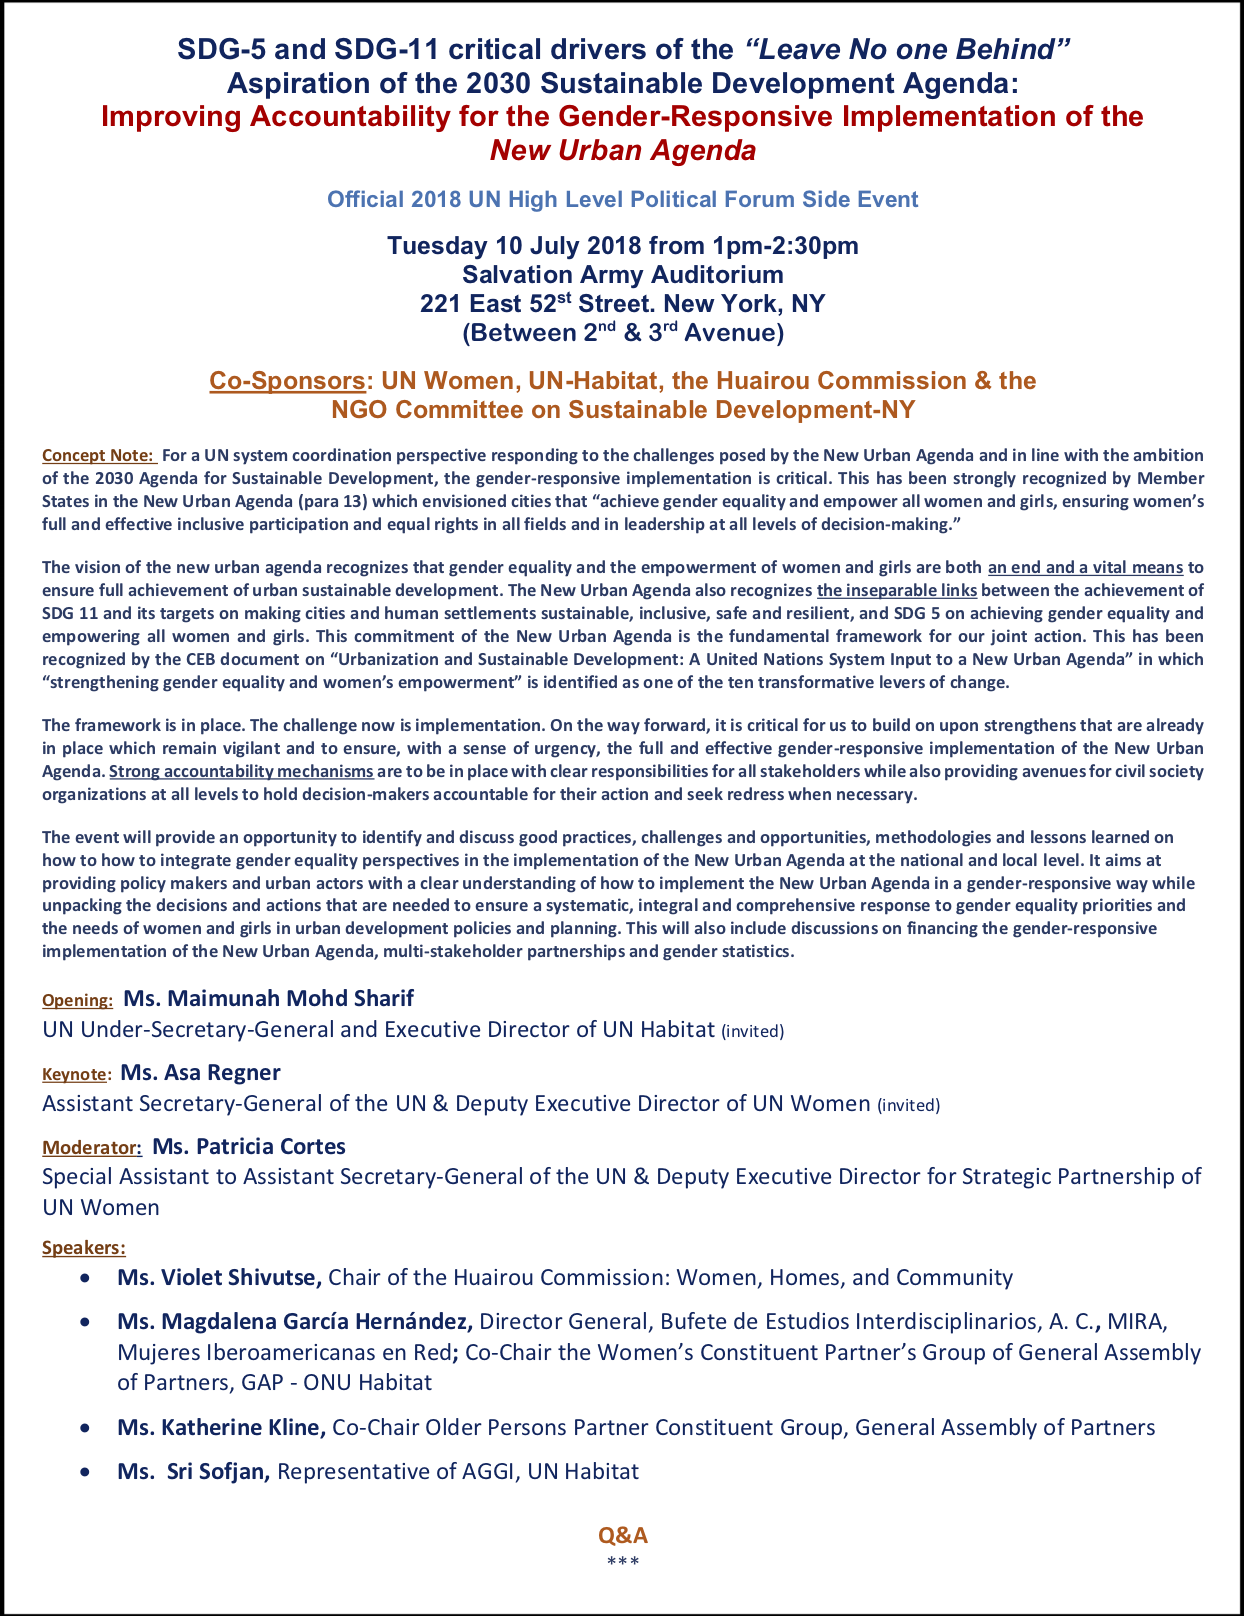 HLPF Side Event 7-10-18 UNWomen-HC-UN Habitat-NGOCSD-NY 3B.png